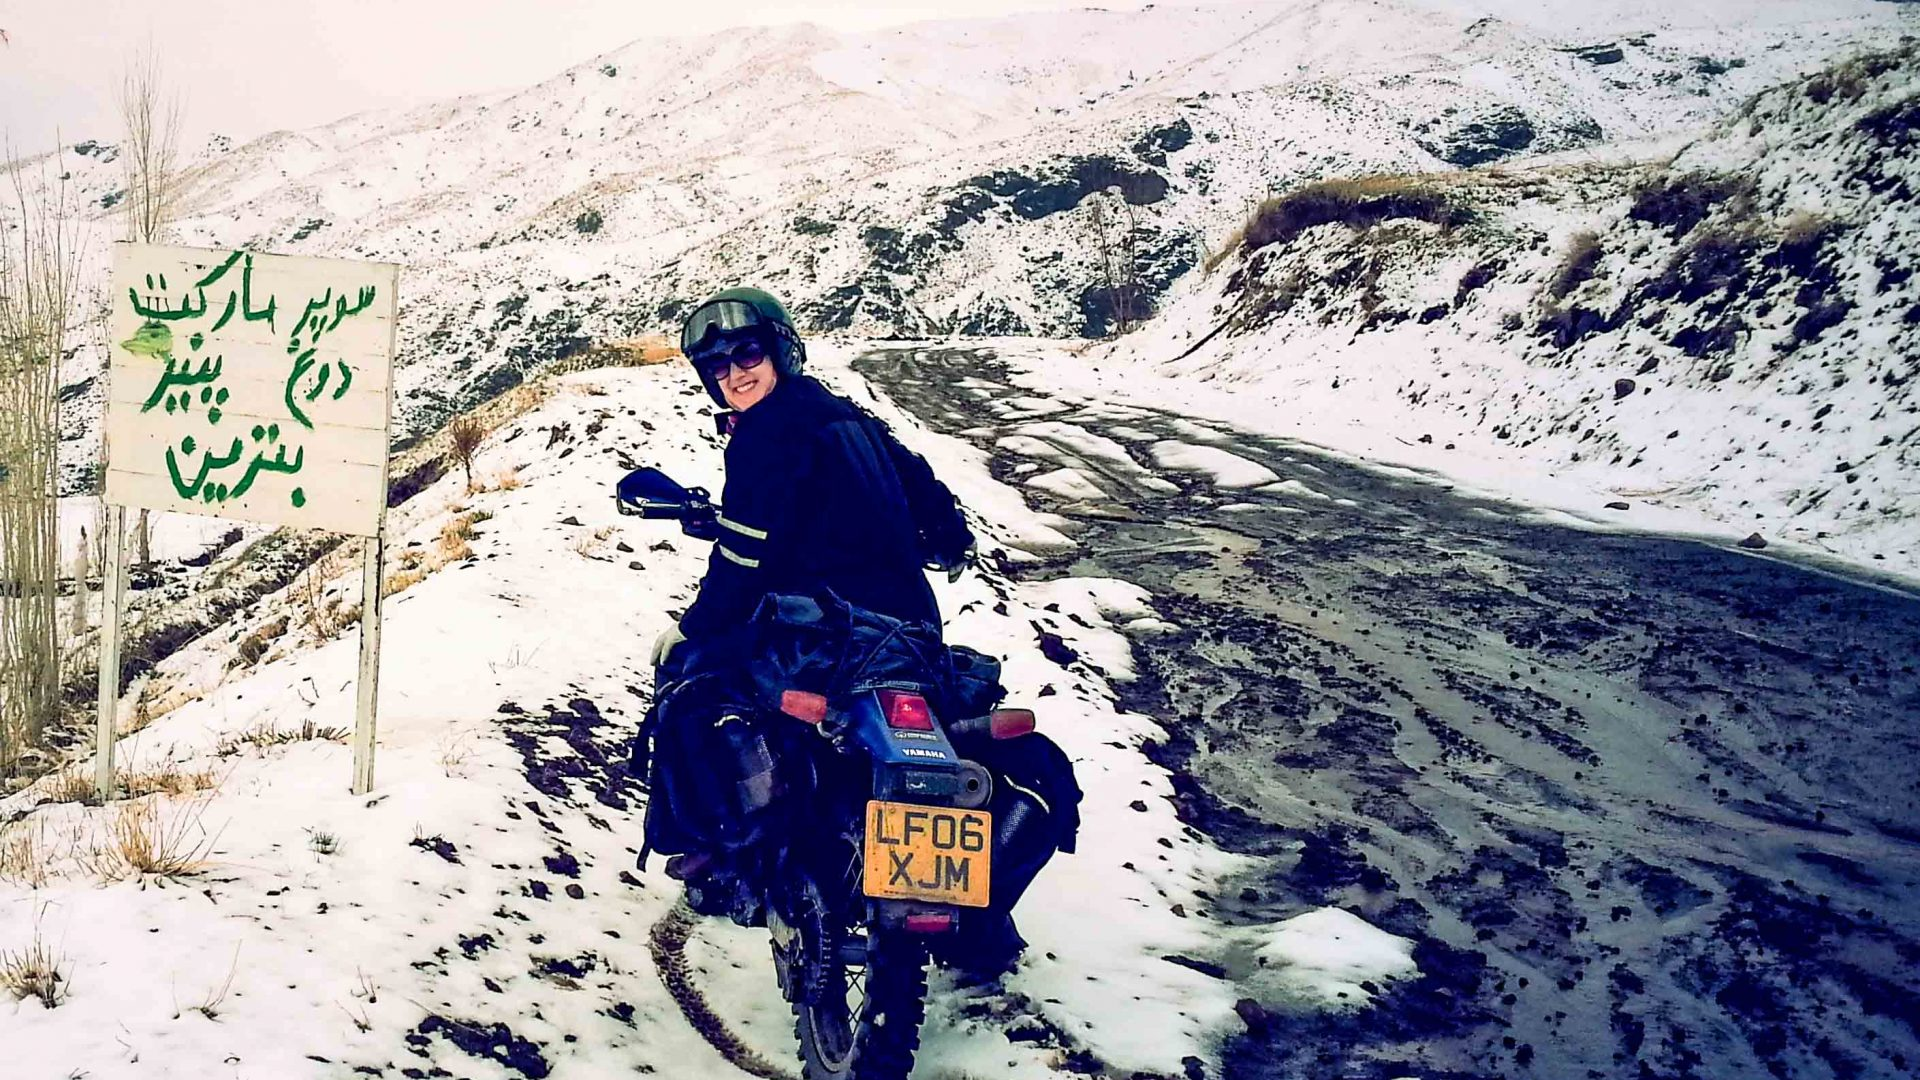 Lois rides her bike through the snow in Iran.